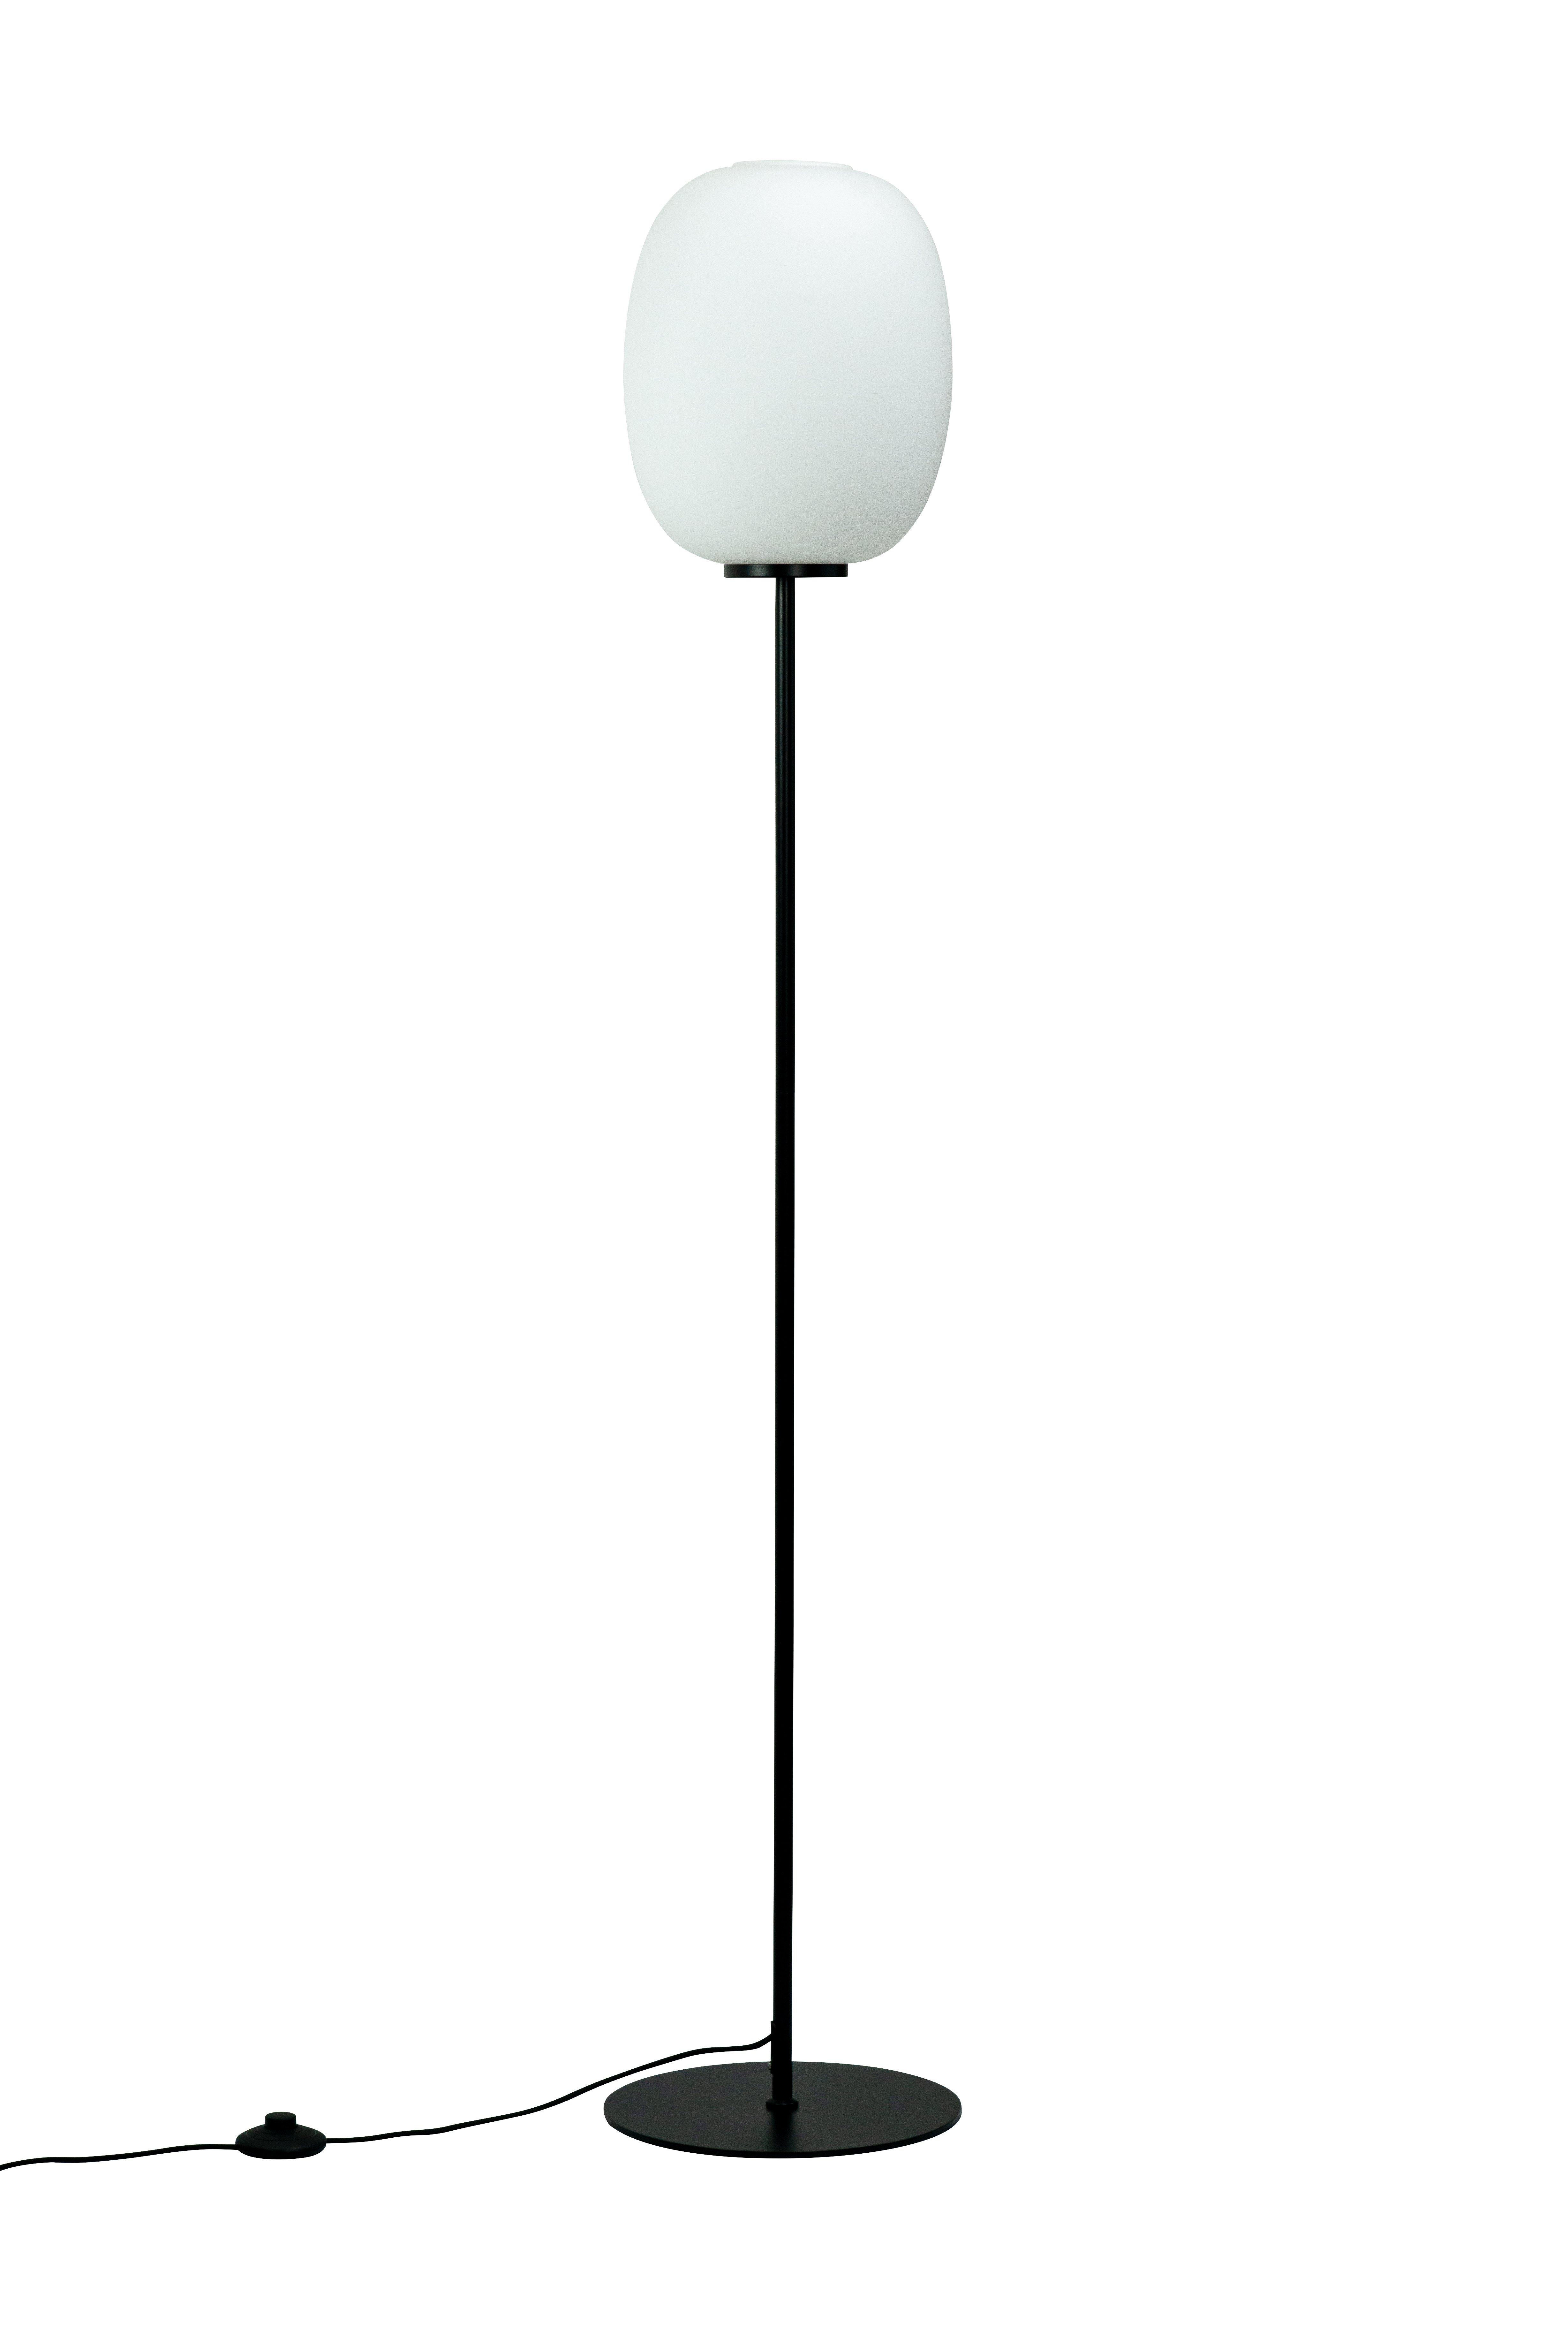 Dyberg-Larsen - DL39 Opal Floor Lamp - Opal With Black Base (8096)